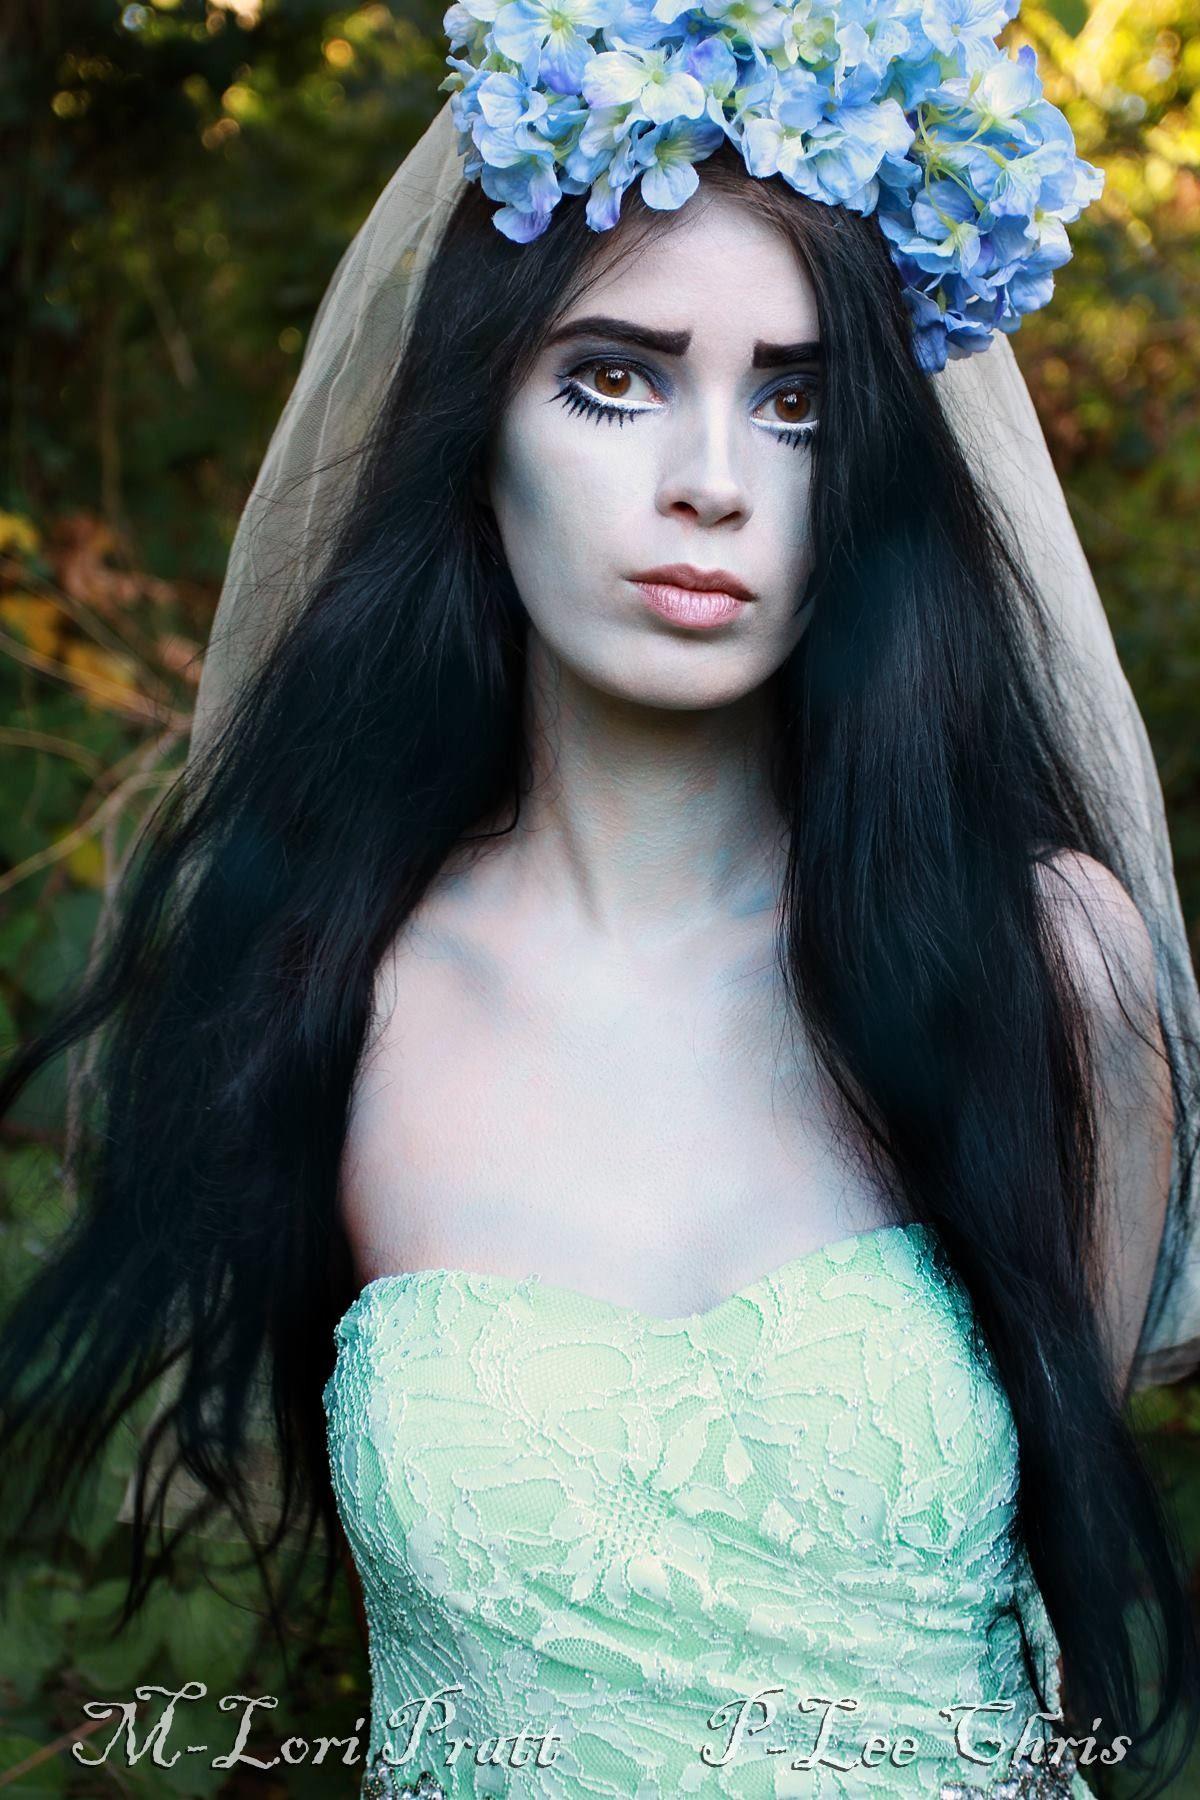 Corpse bride makeup costumes u dramatic looks pinterest corpse